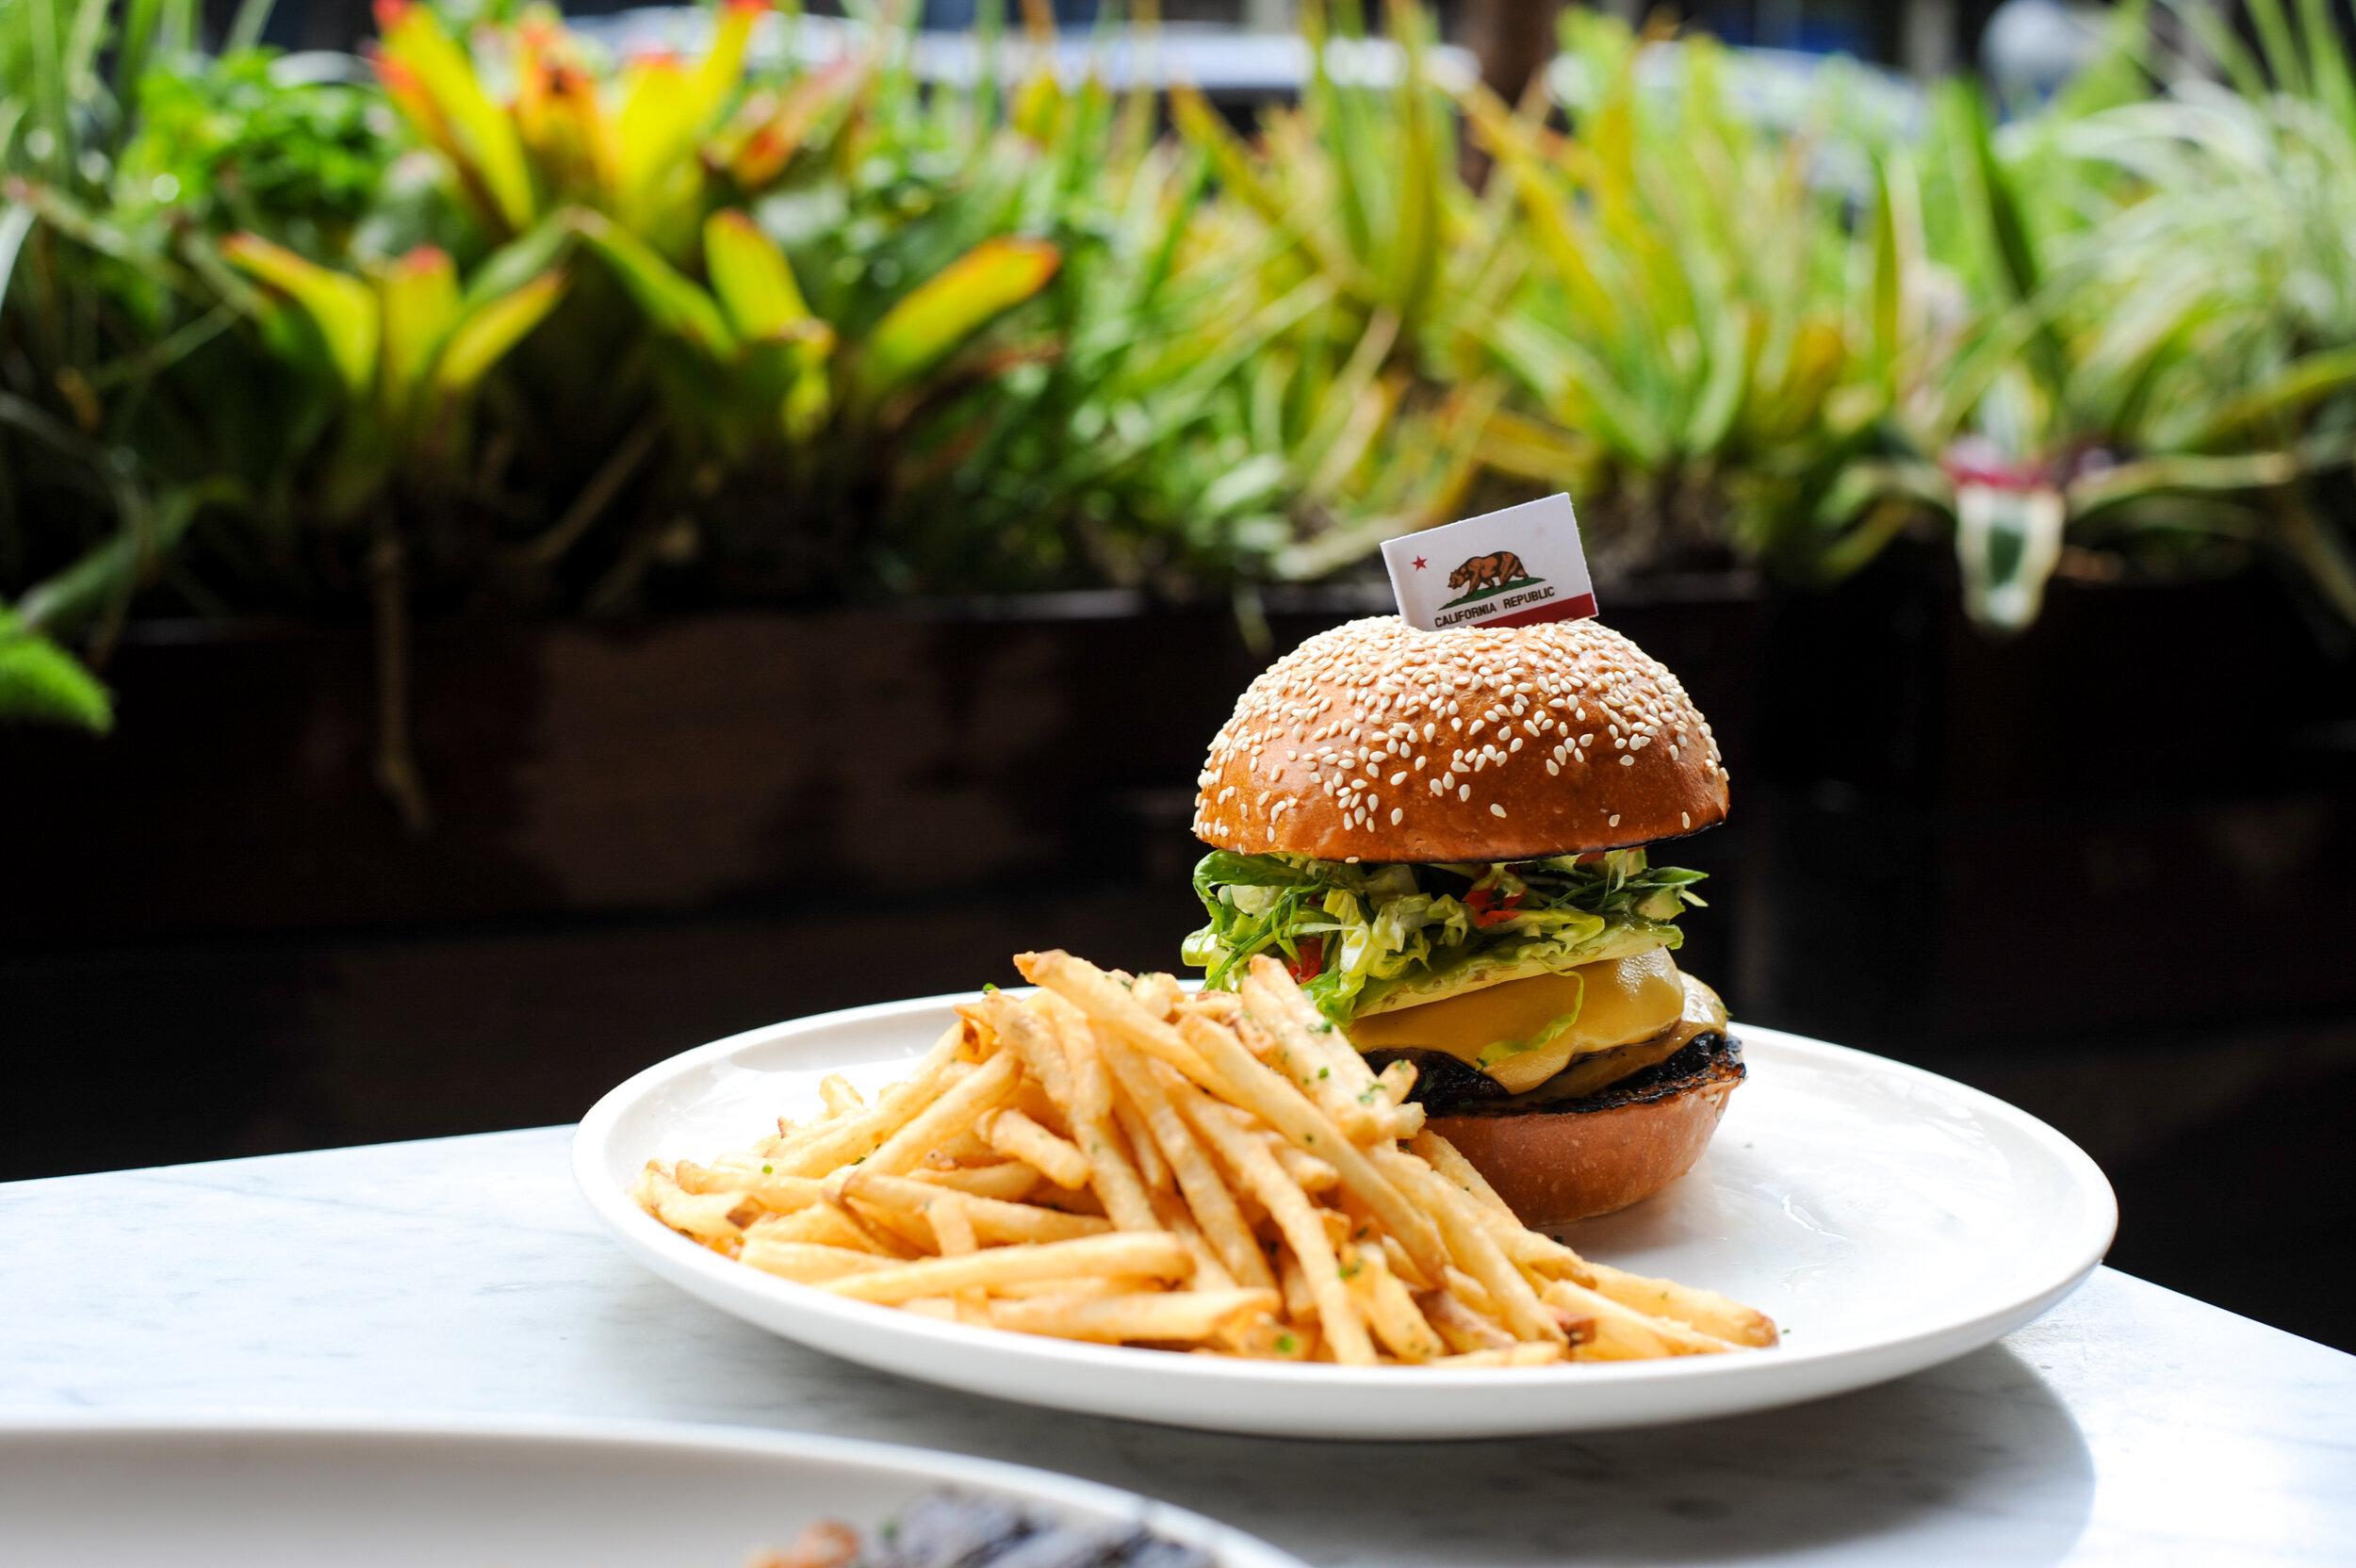 Upland Miami Cheeseburger $5